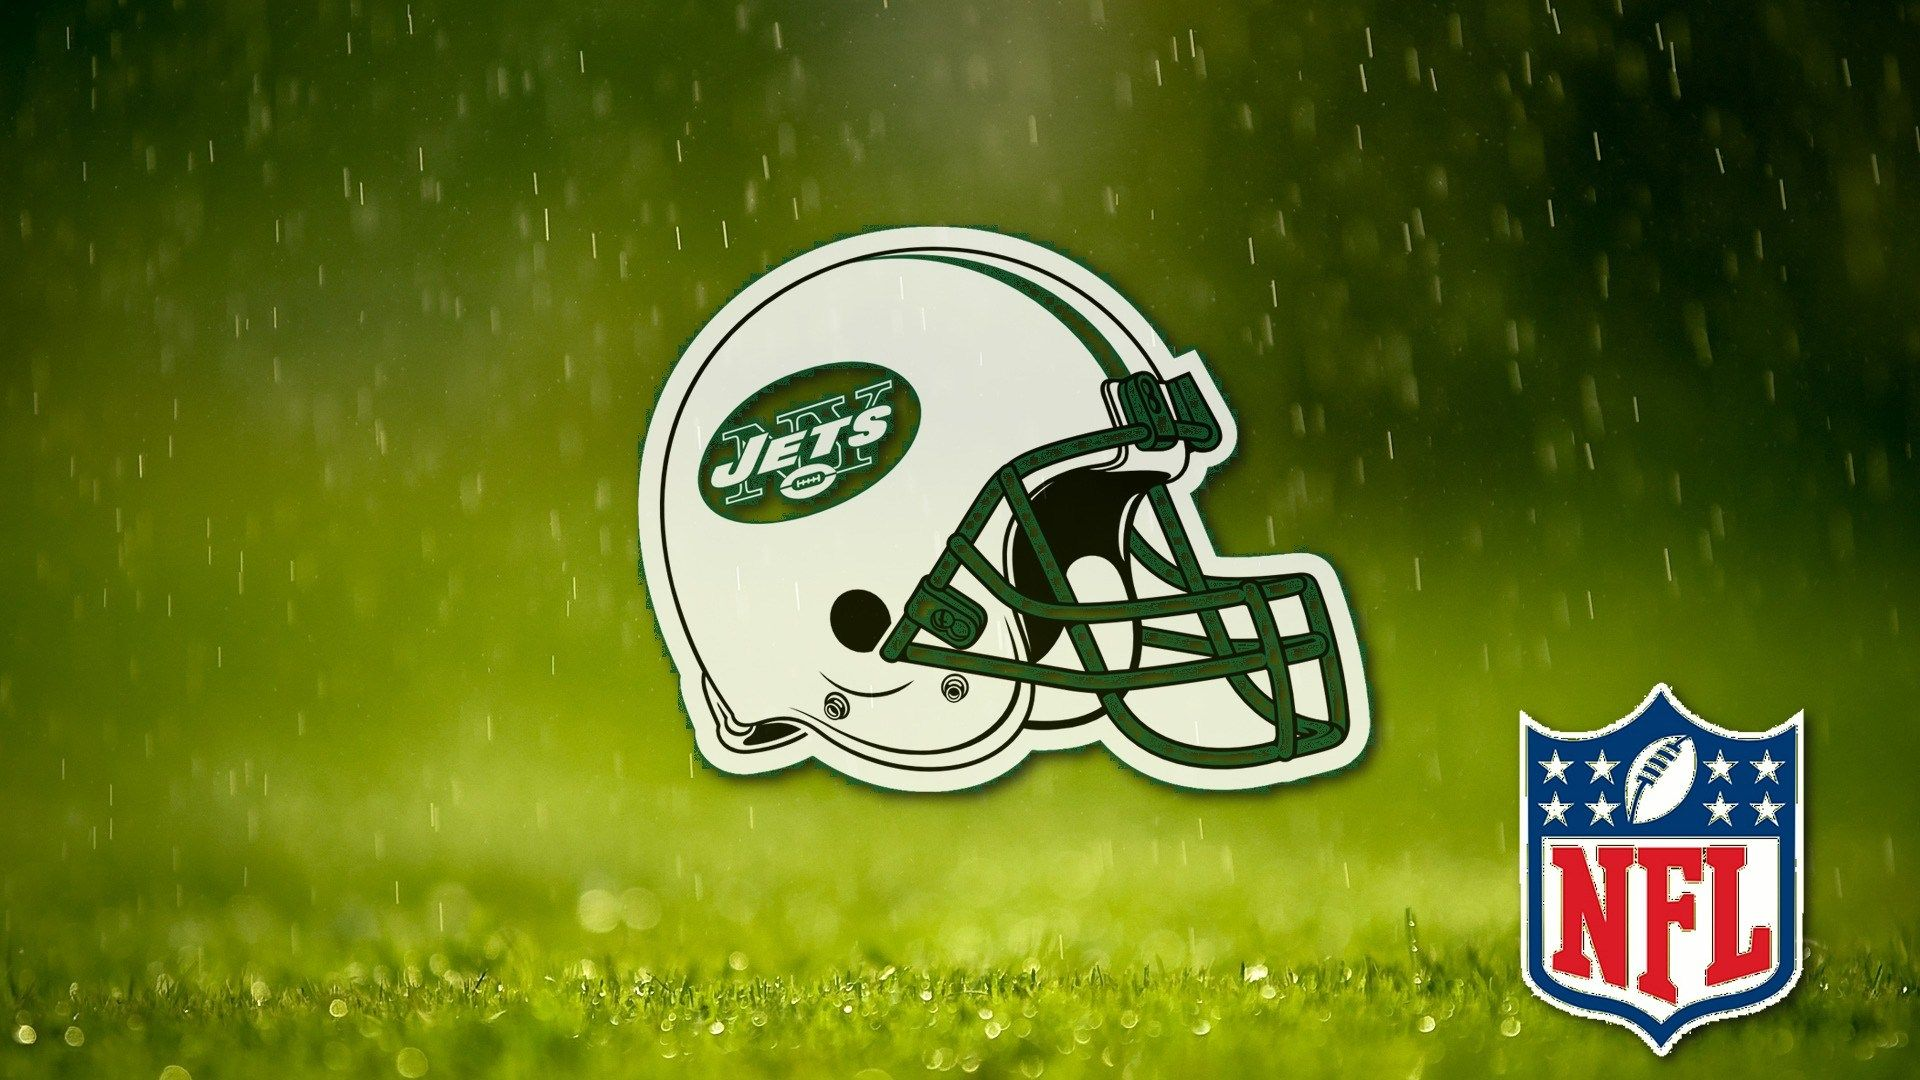 Nfl Ny Jets Helmet On Field Grass Wallpapers 1920x1080